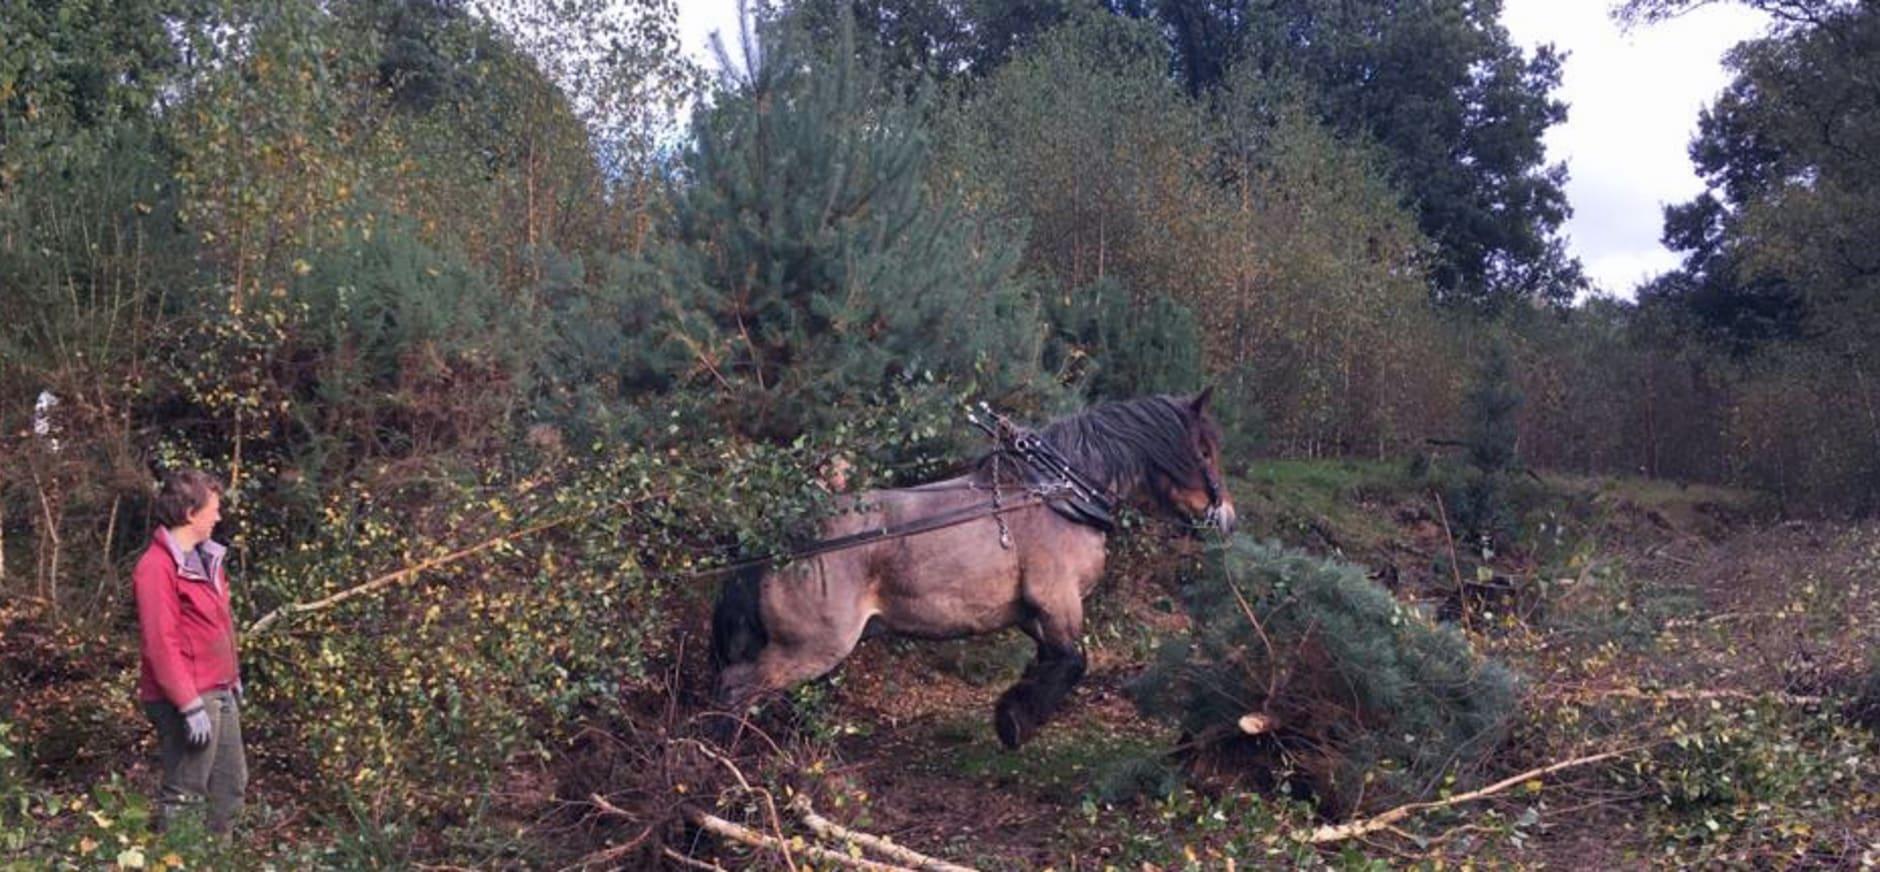 Werkpaard op de Beekhuizense heide